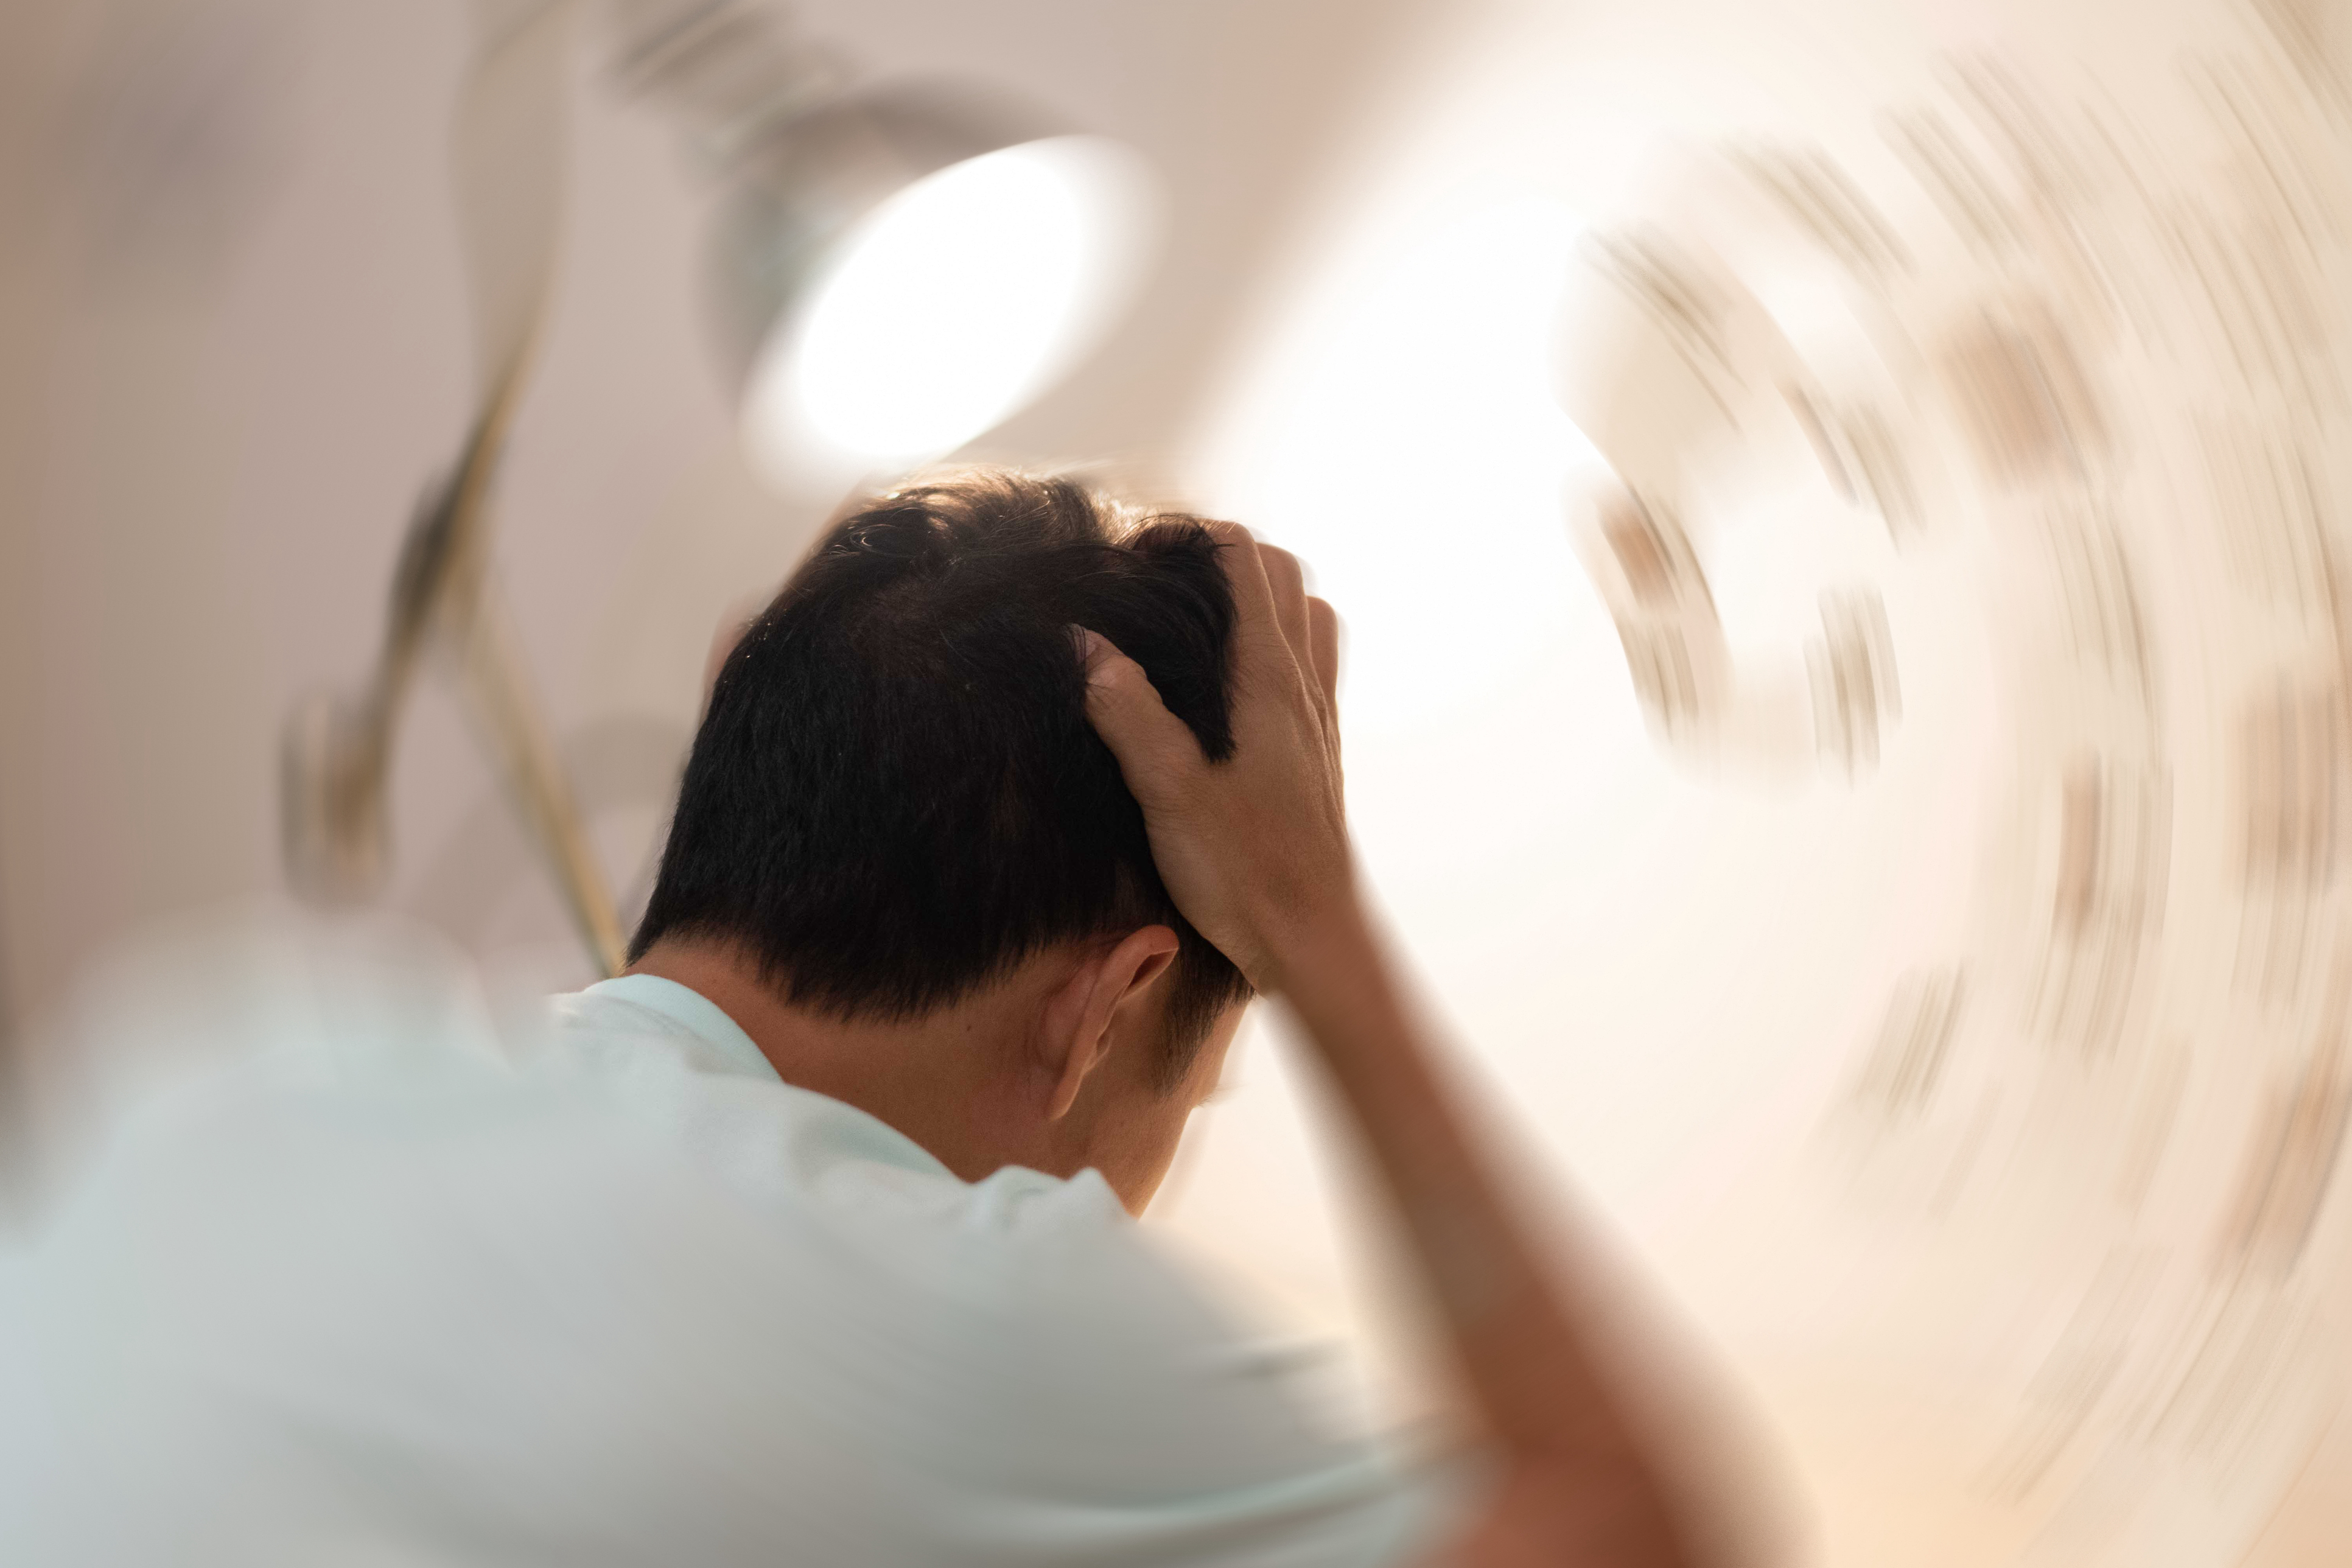 Vertigo illness concept. Man hands on his head felling headache dizzy sense of spinning dizziness,a problem with the inner ear, brain, or sensory nerve pathway. (Vertigo illness concept. Man hands on his head felling headache dizzy sense of spinning d